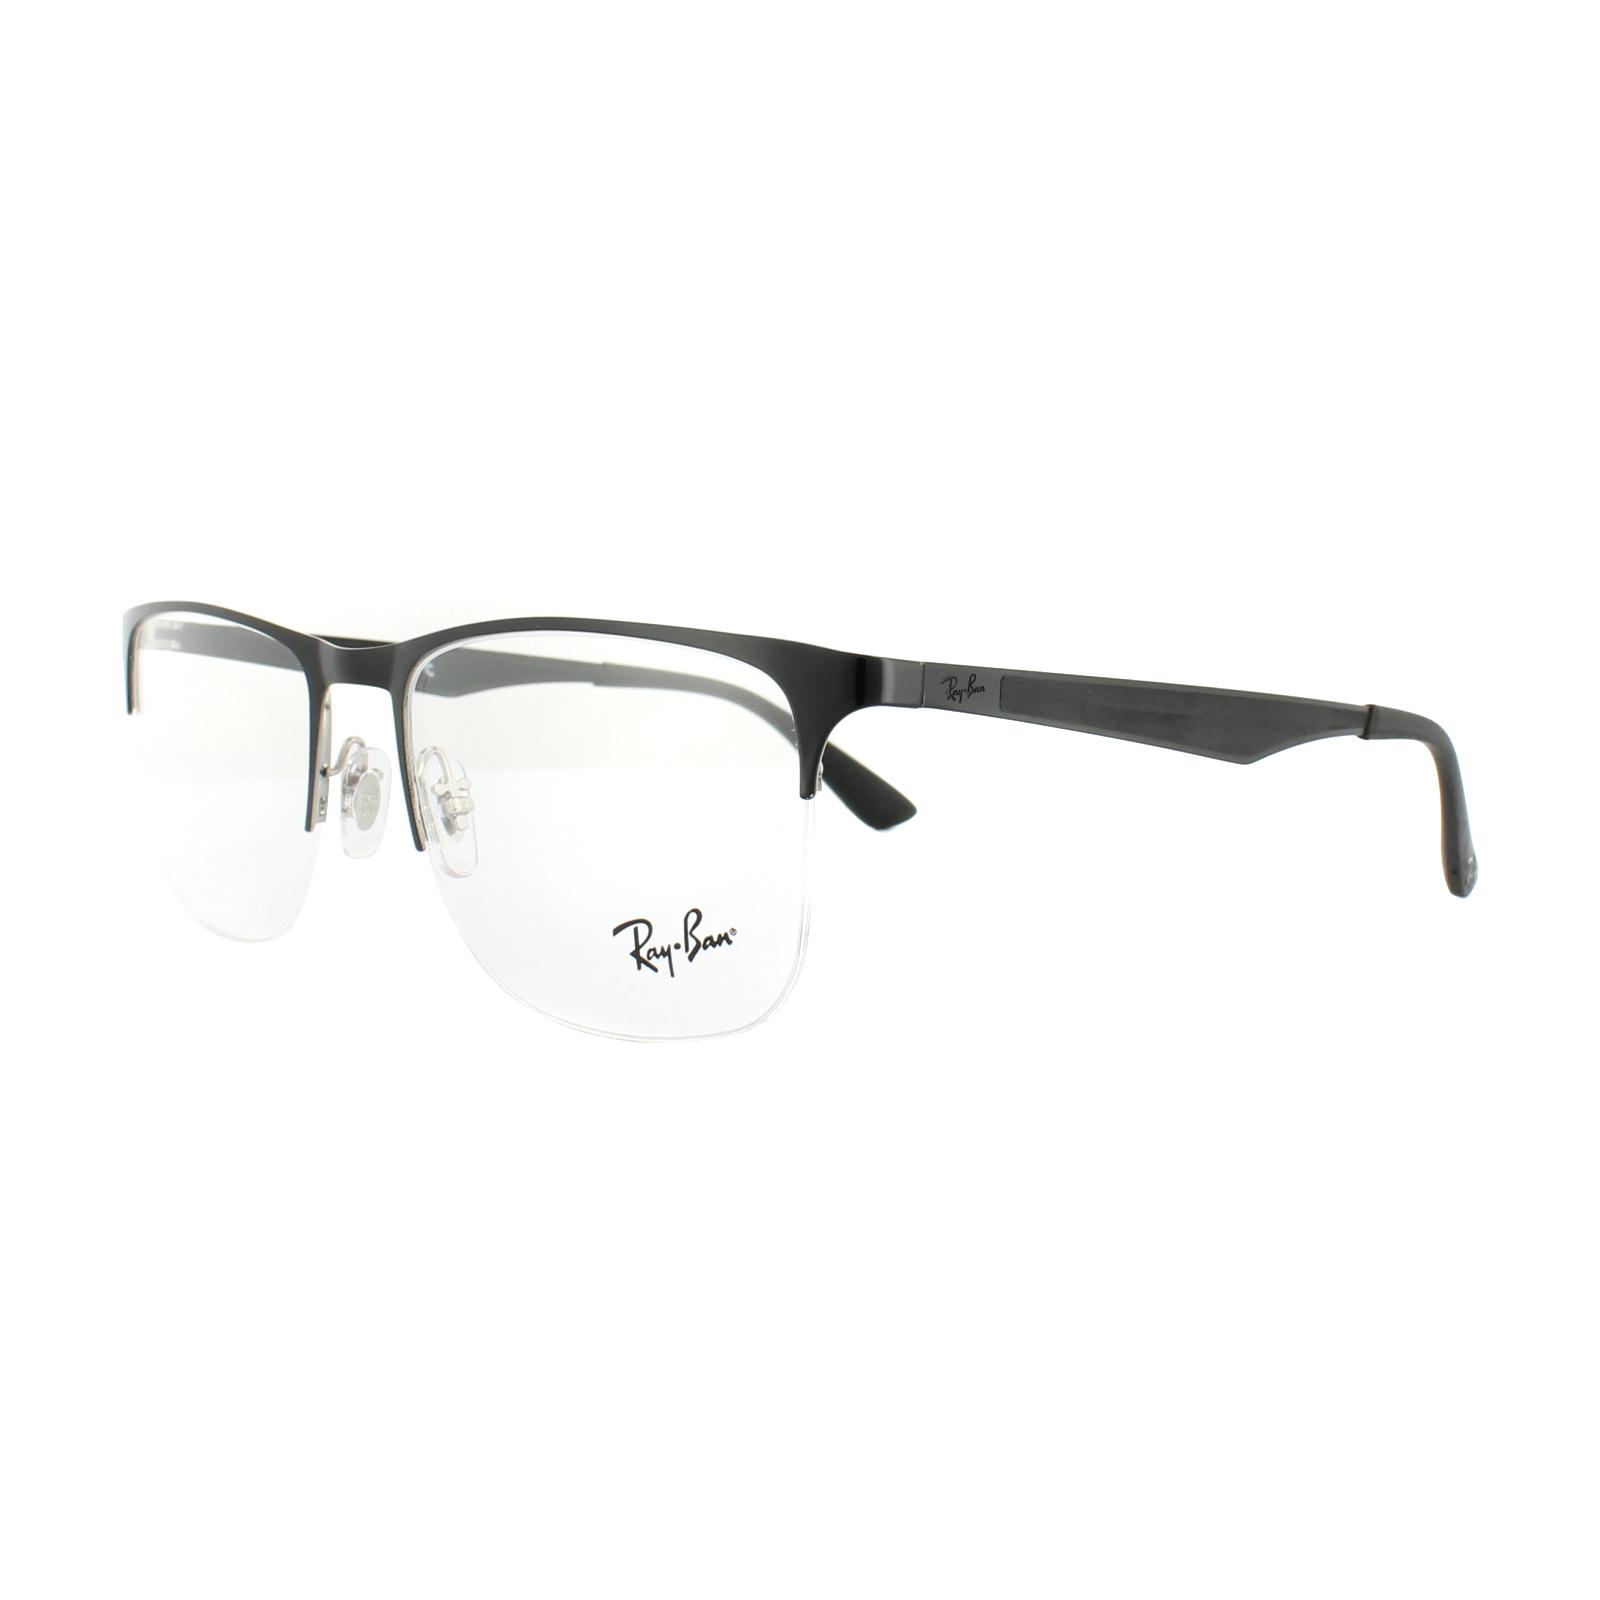 a0cccbc4826 Sentinel Ray-Ban Glasses Frames RX 6362 2861 Silver Top Shiny Black Mens  55mm